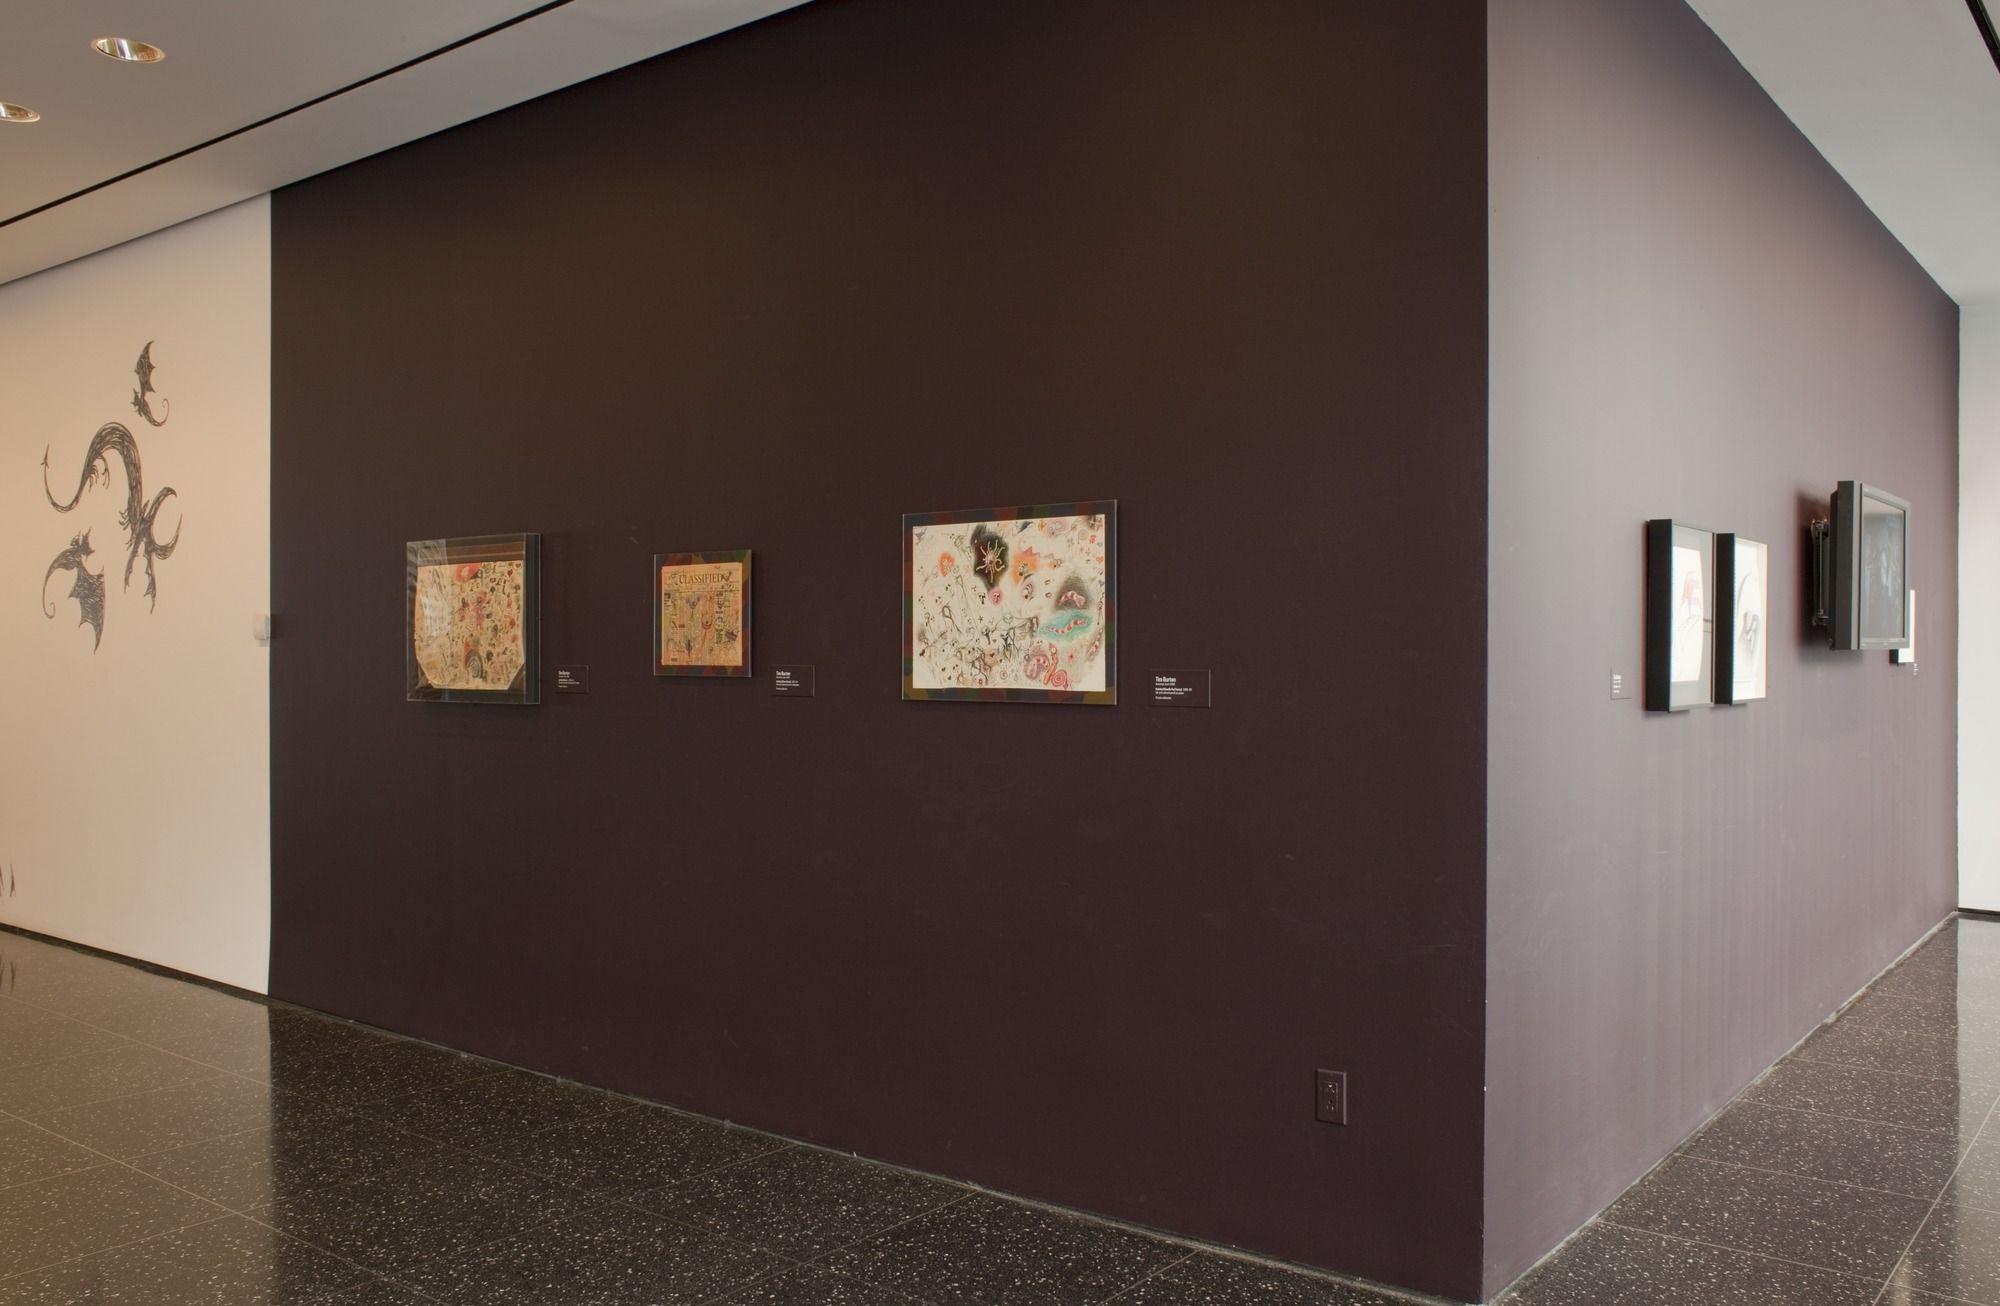 Museum Of Modern Art Moma Moma Tim Burton Exhibit Museum Of Modern Art